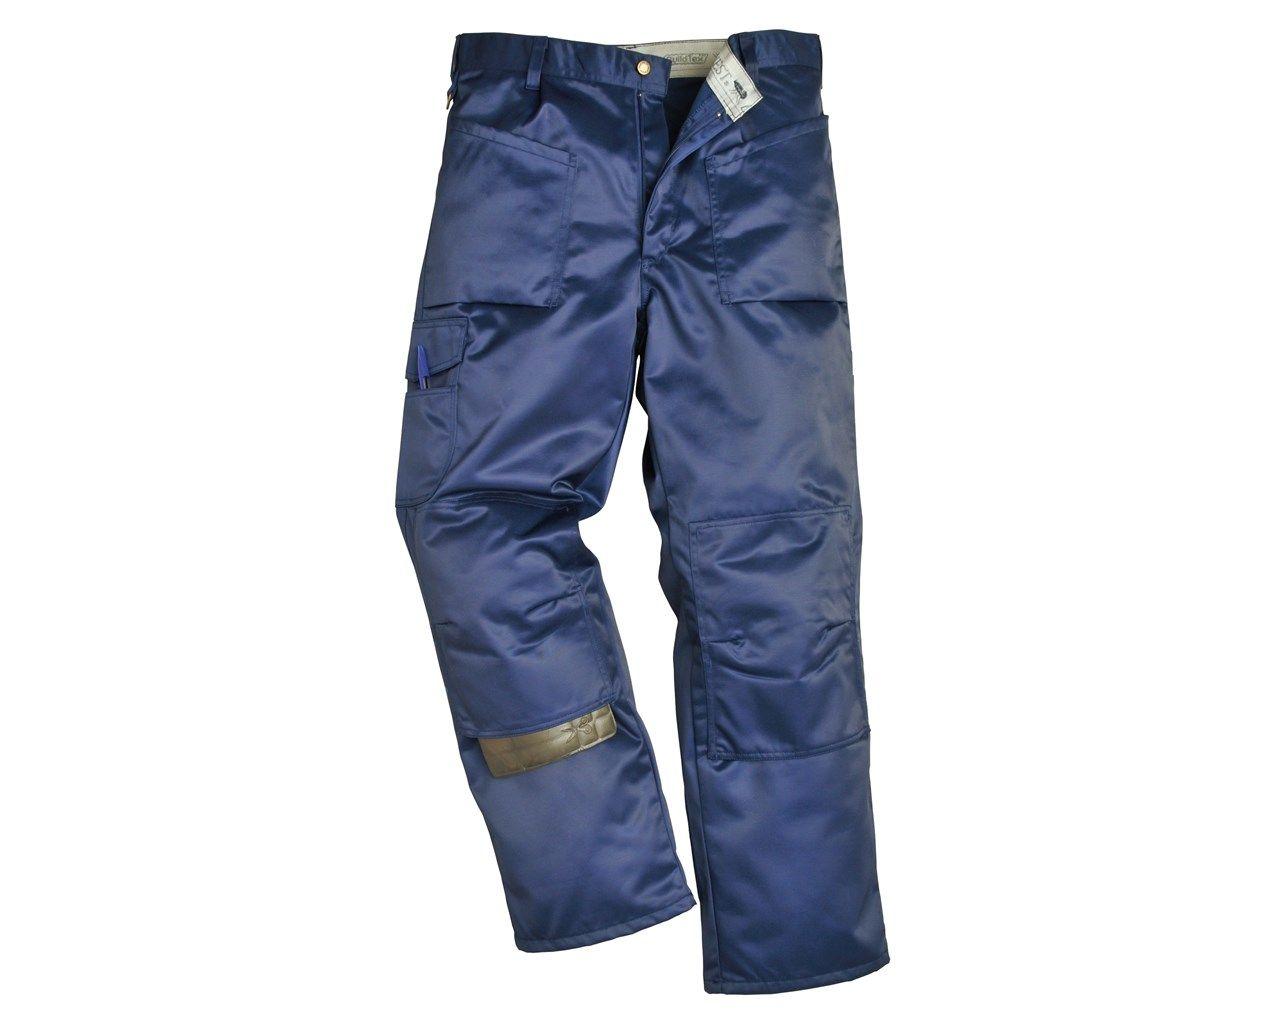 Portwest Ohio Trousers, S152 - MammothWorkwear.com